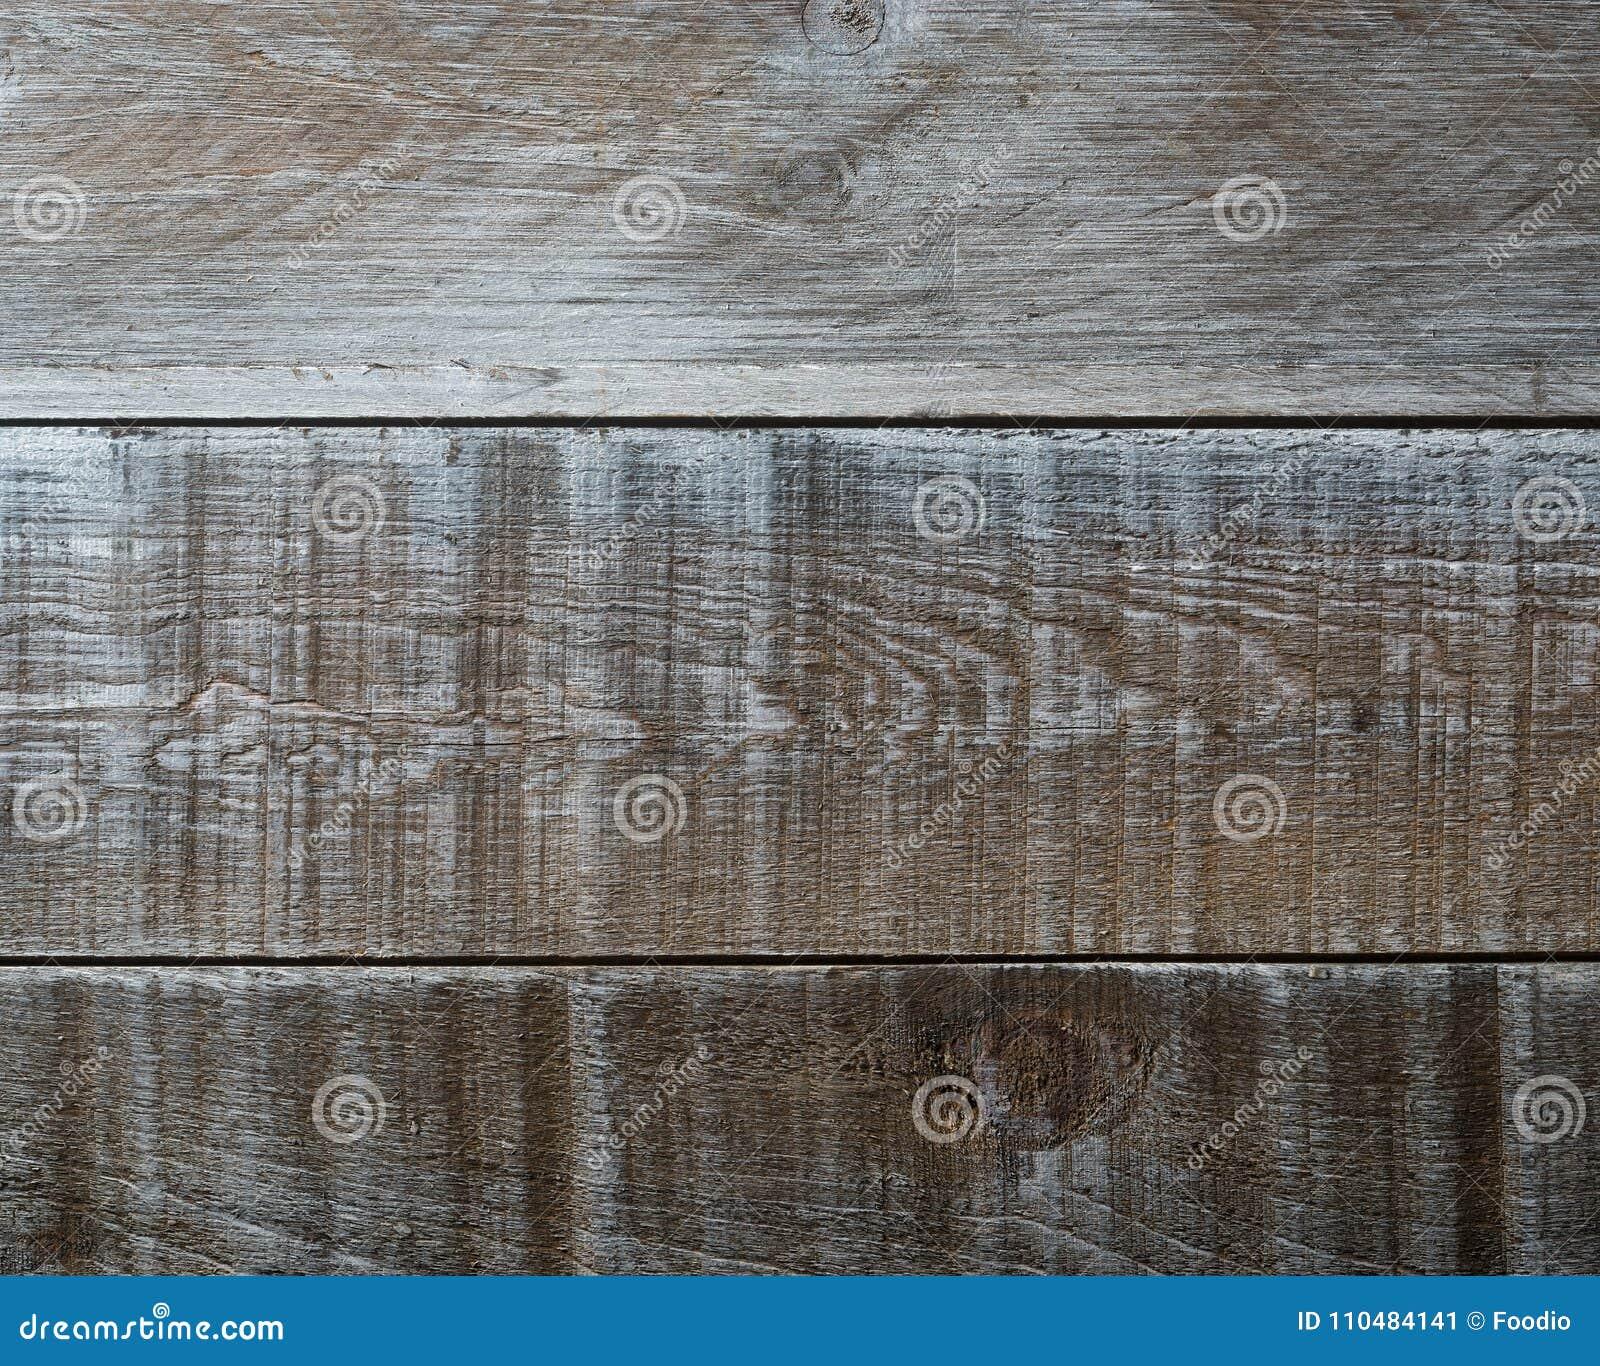 Rustic Barn Board Background